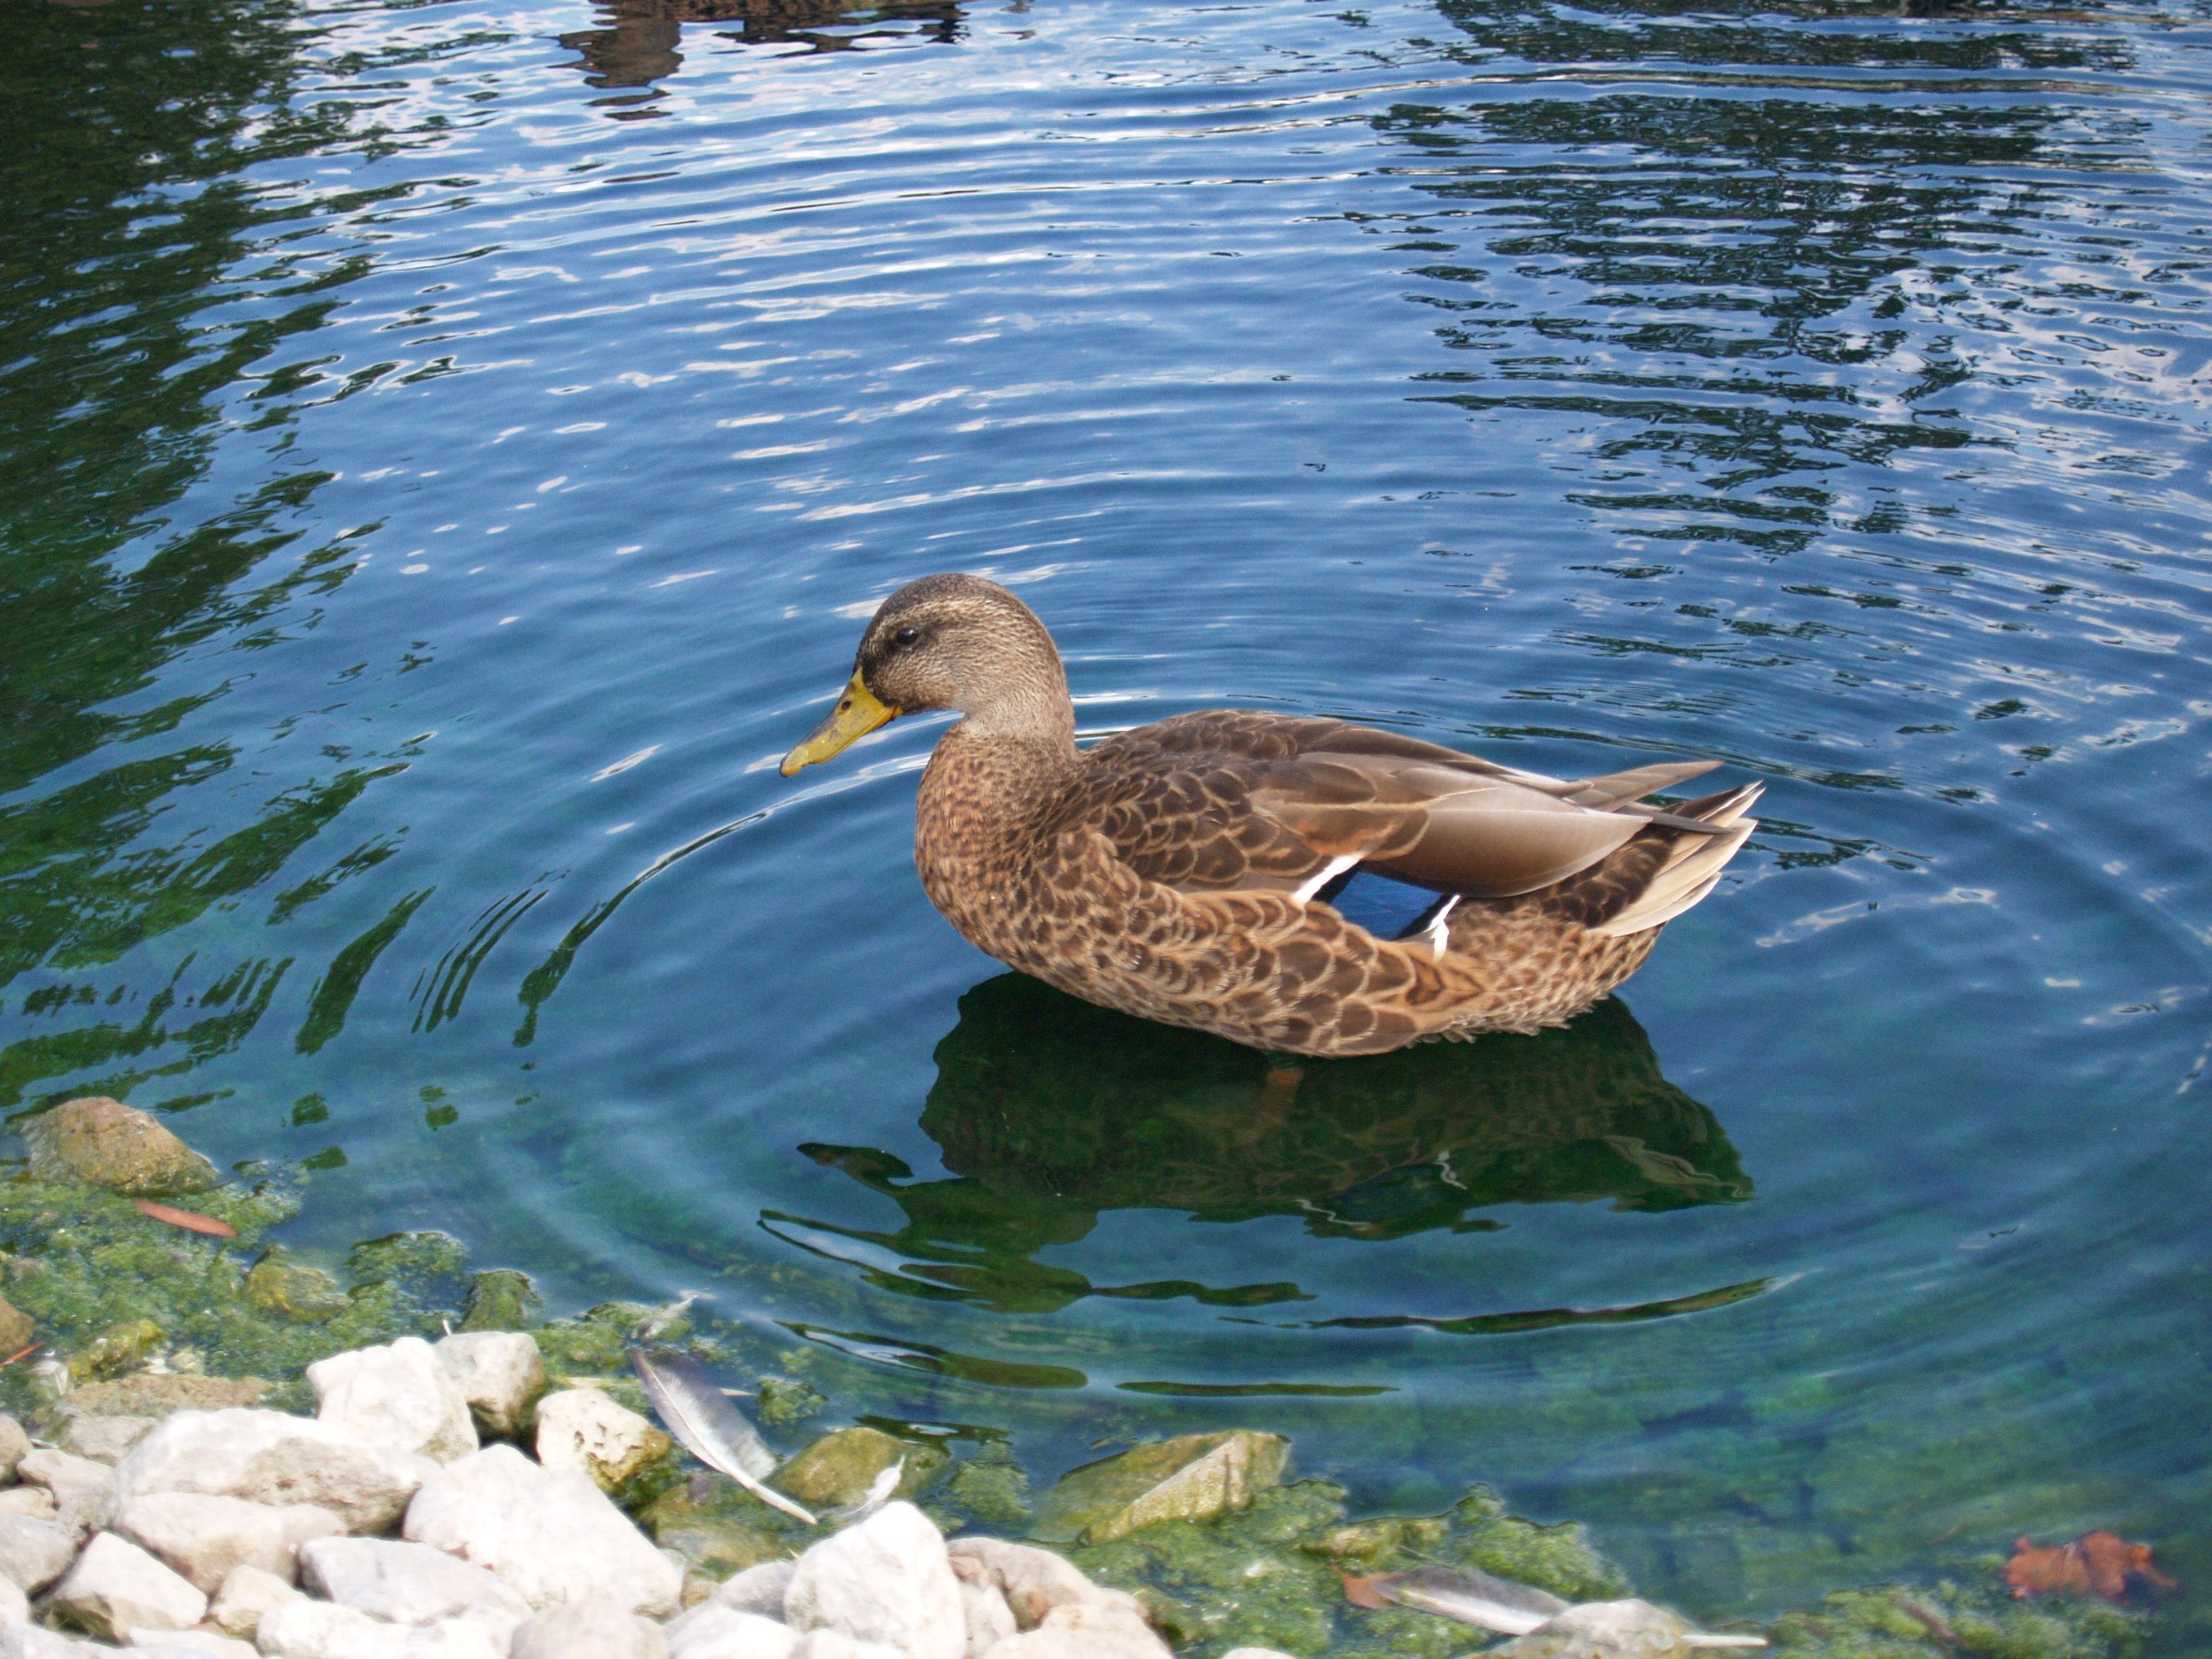 Hd Animal Wallpapers Hd Duck Wallpapers